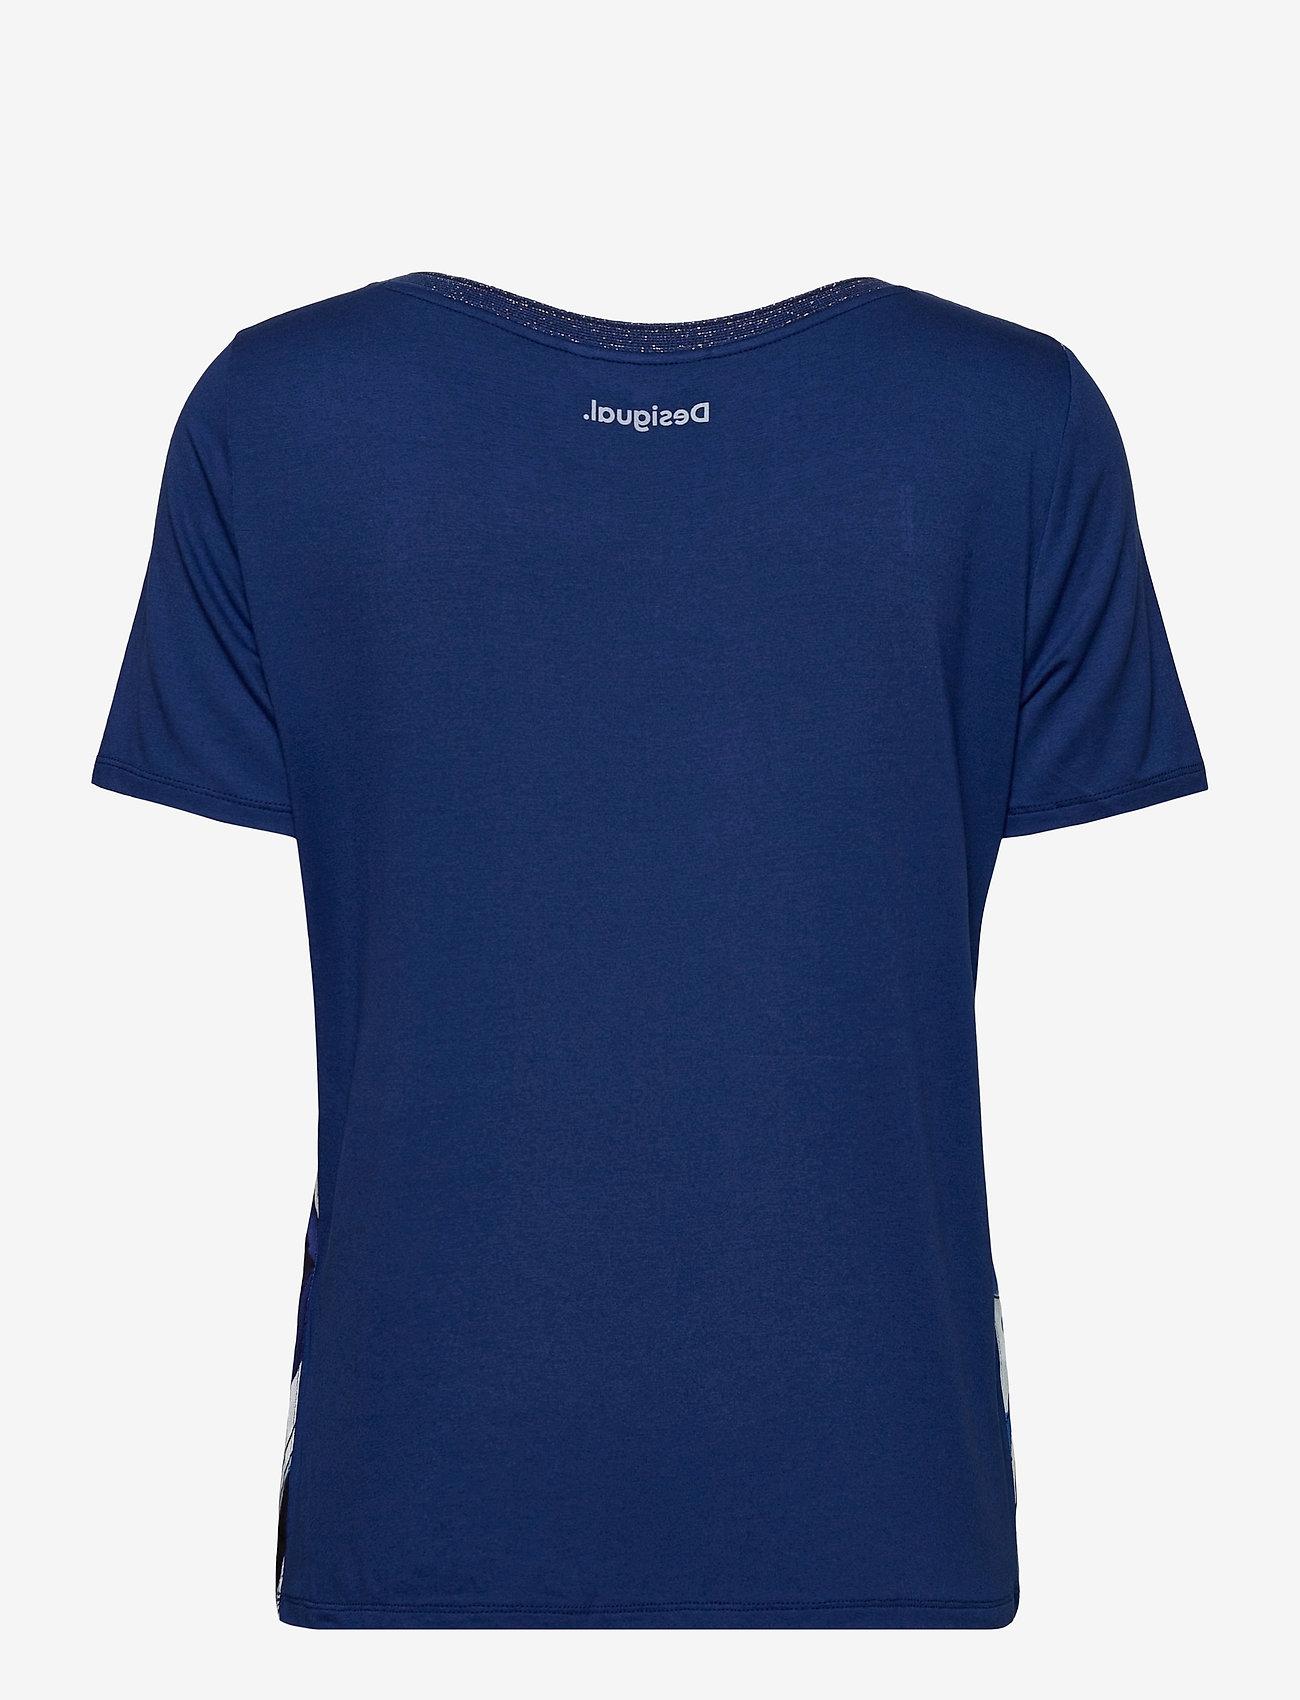 Desigual - TS PALS - t-shirts - estate blue - 1